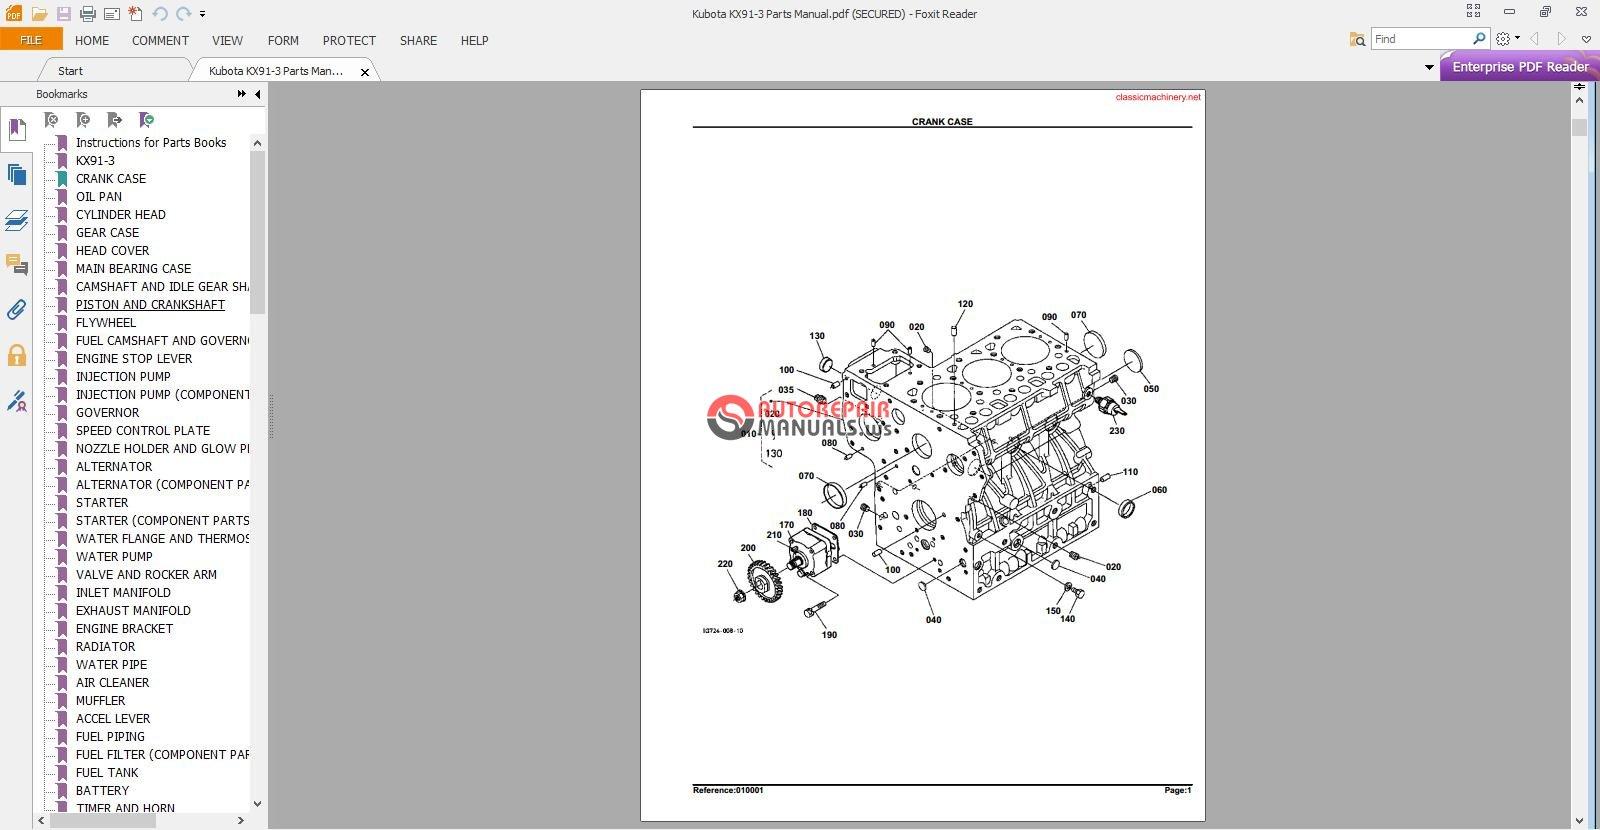 hight resolution of  kubota kx91 3 parts manual 2 jpg